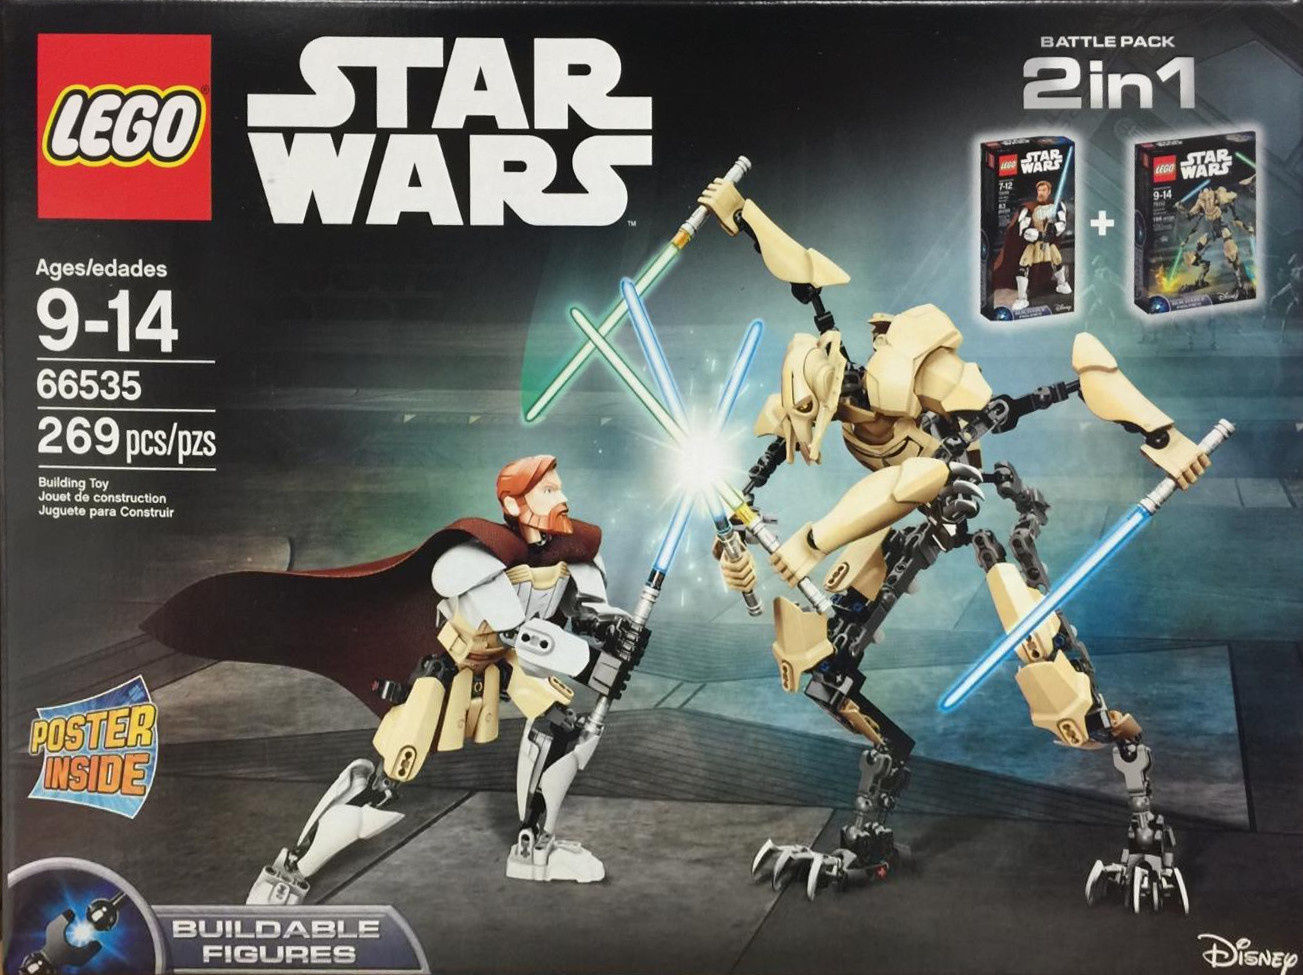 Battle Pack 2 In 1 Lego Star Wars Set 66535